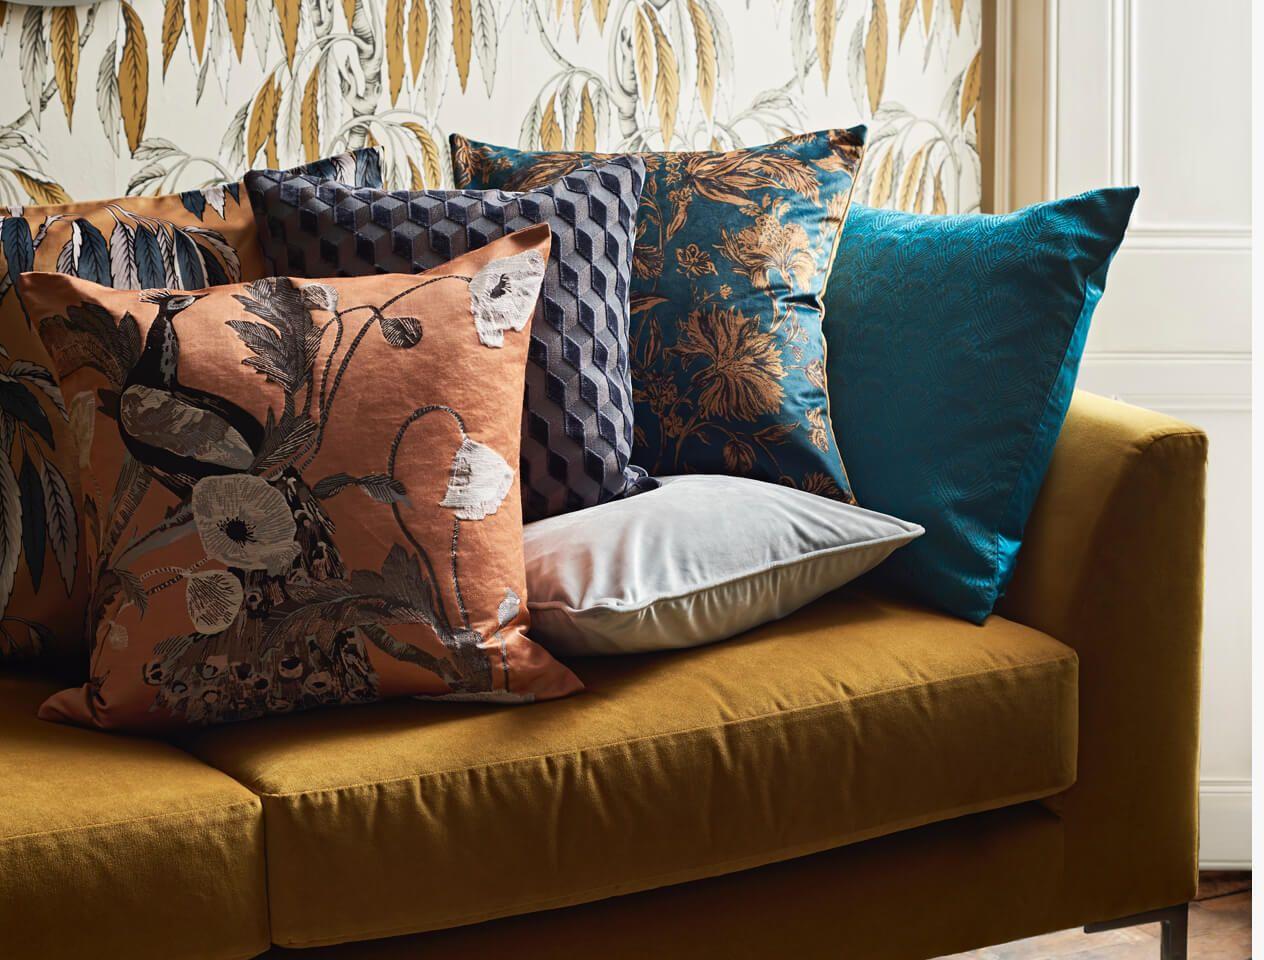 Patterned cushions on a velvet sofa